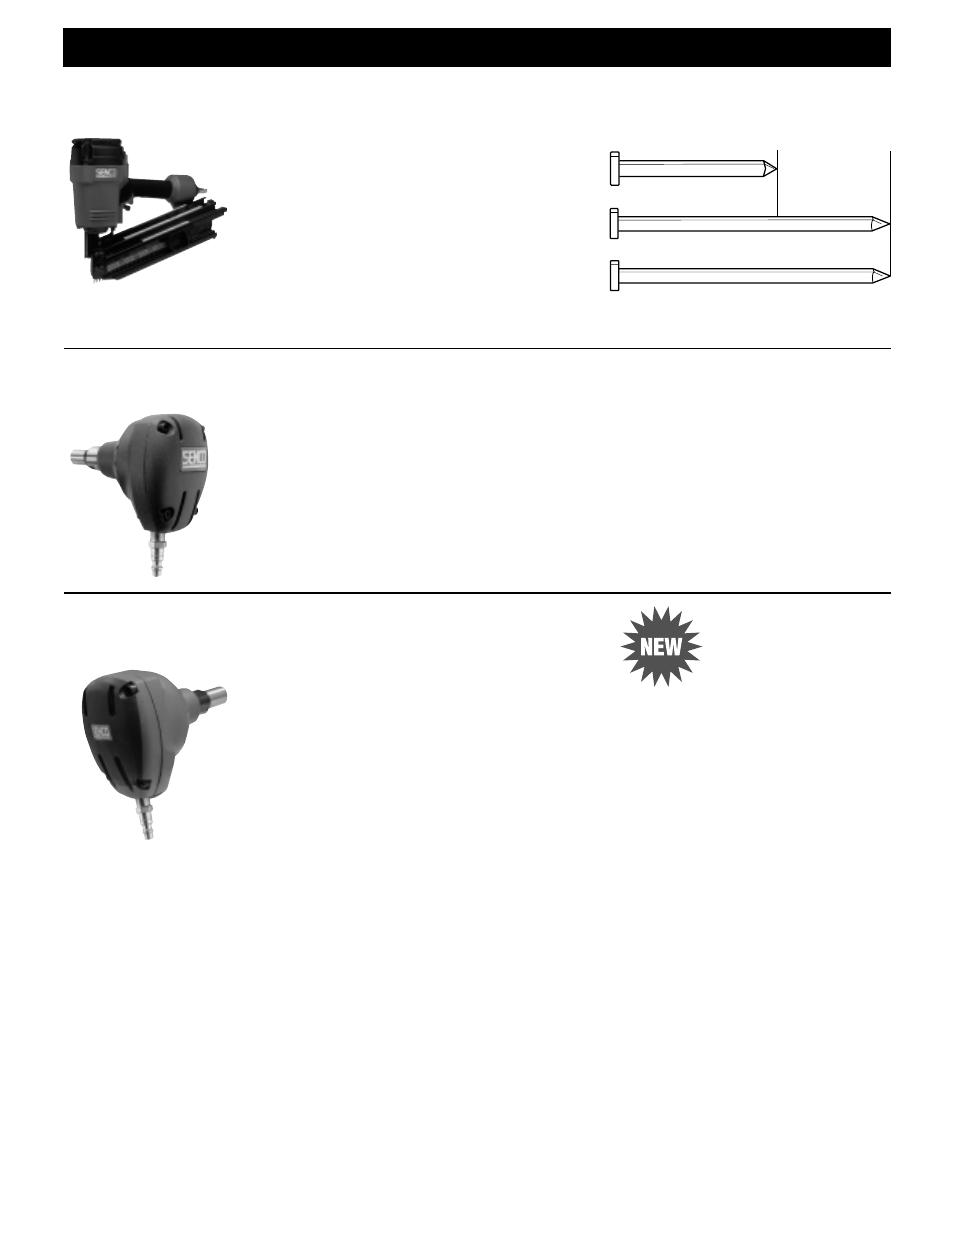 Bulk Lot Of Senco Owners Manuals Price Guides & Publications